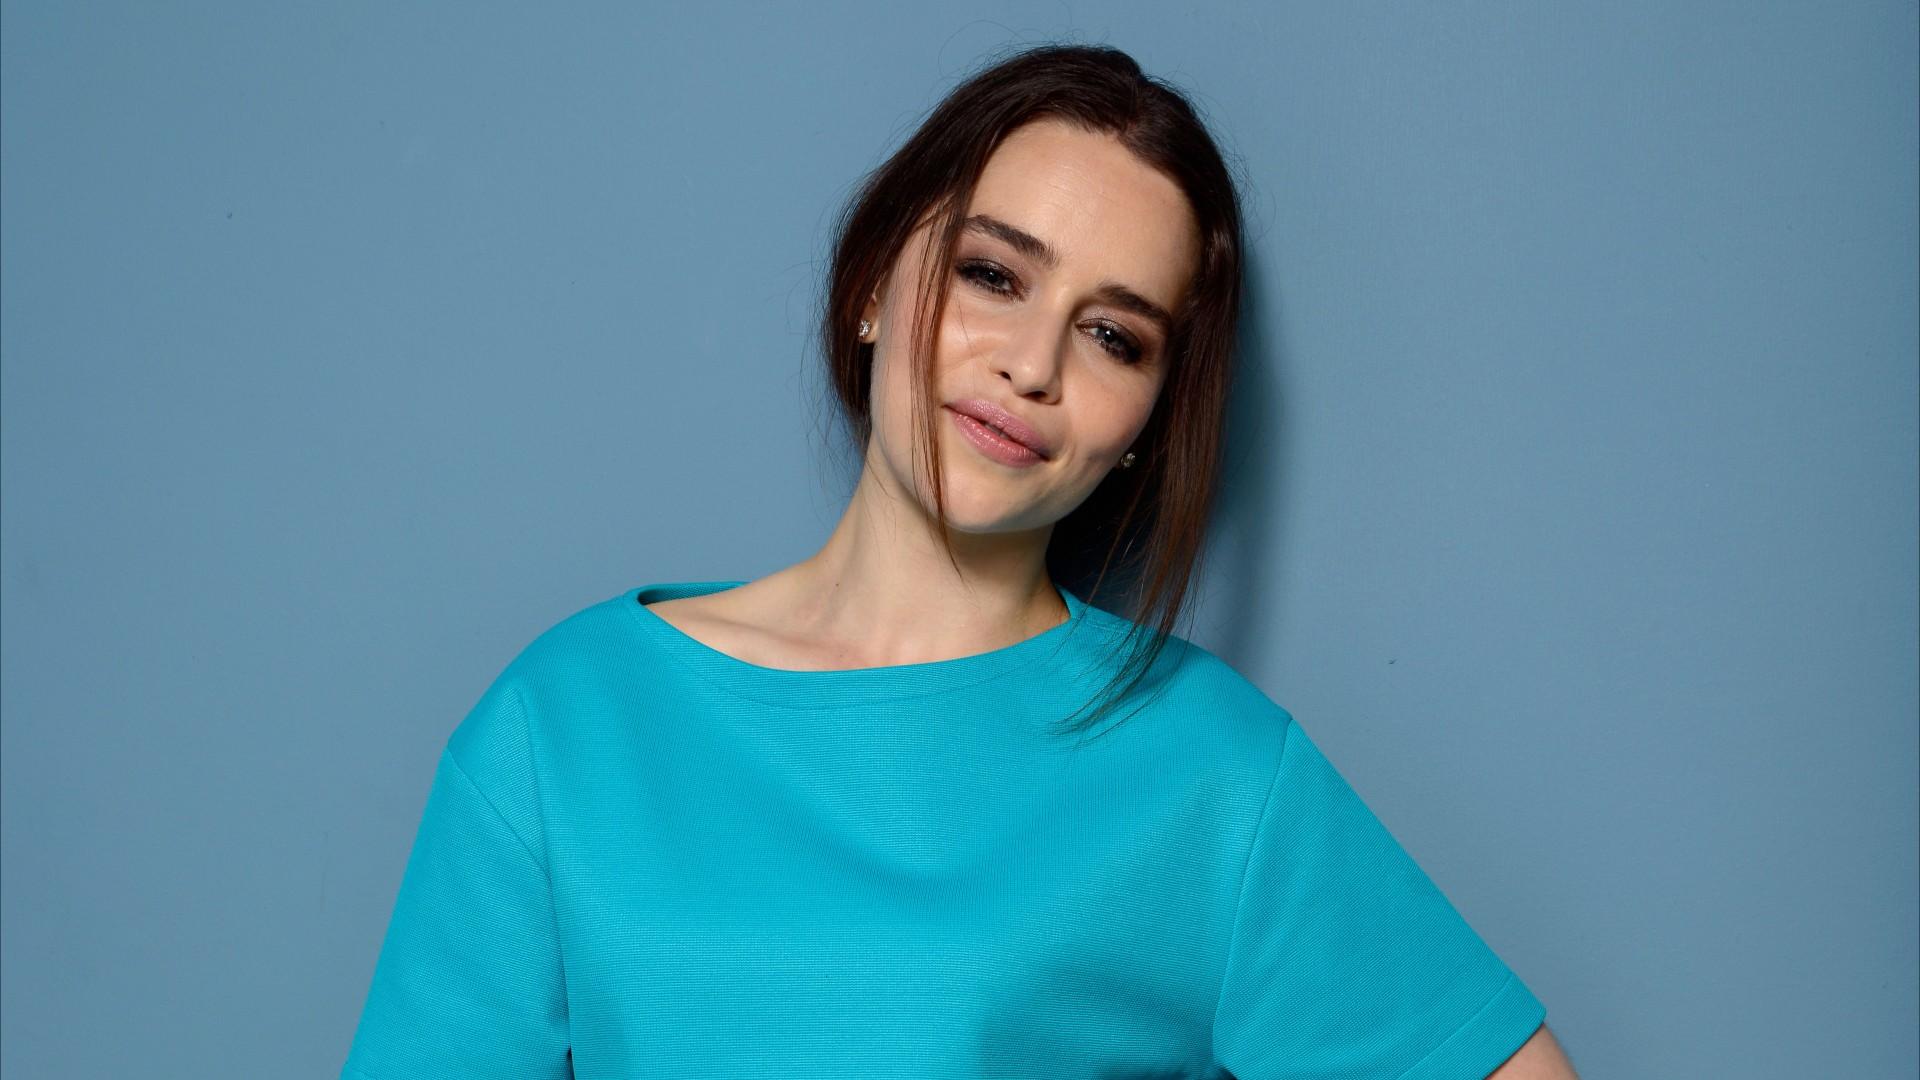 Emilia Clarke Beautiful Wallpapers